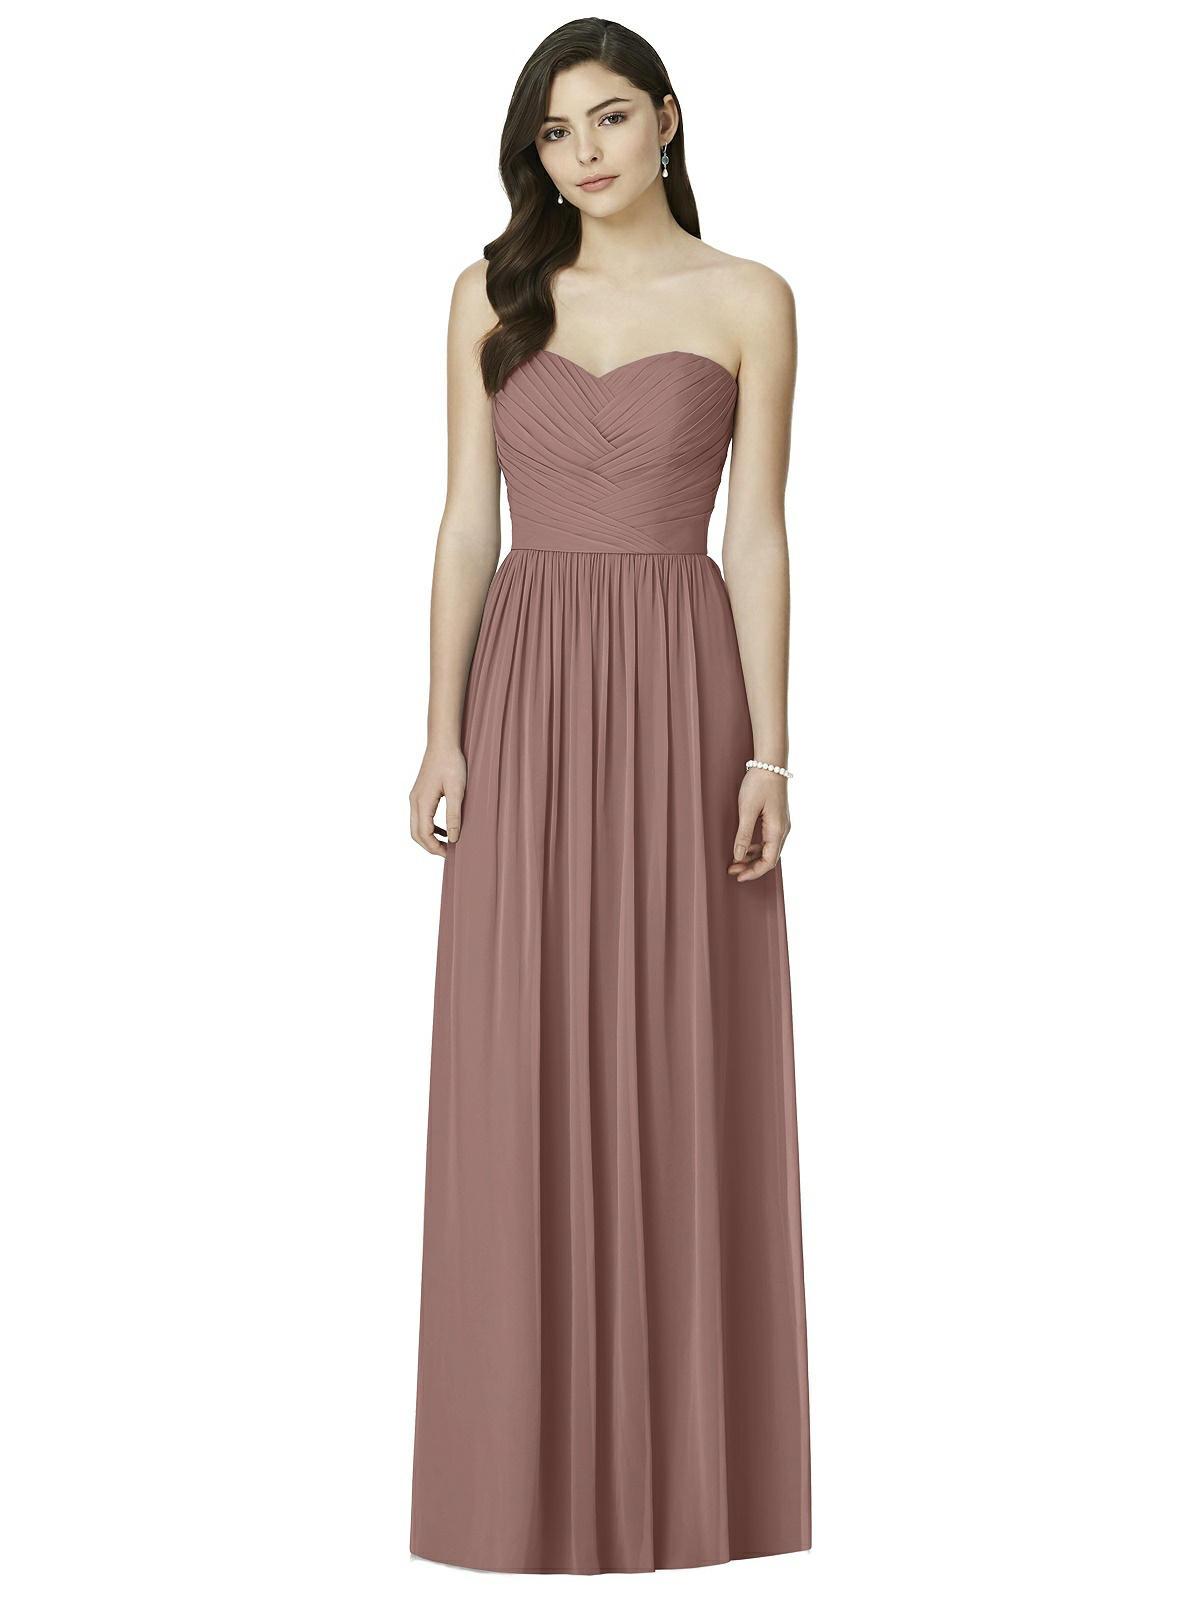 04dcacff4e4 Home · Bridesmaid Dresses · Dessy Bridesmaid Dress 2991. ○  ○